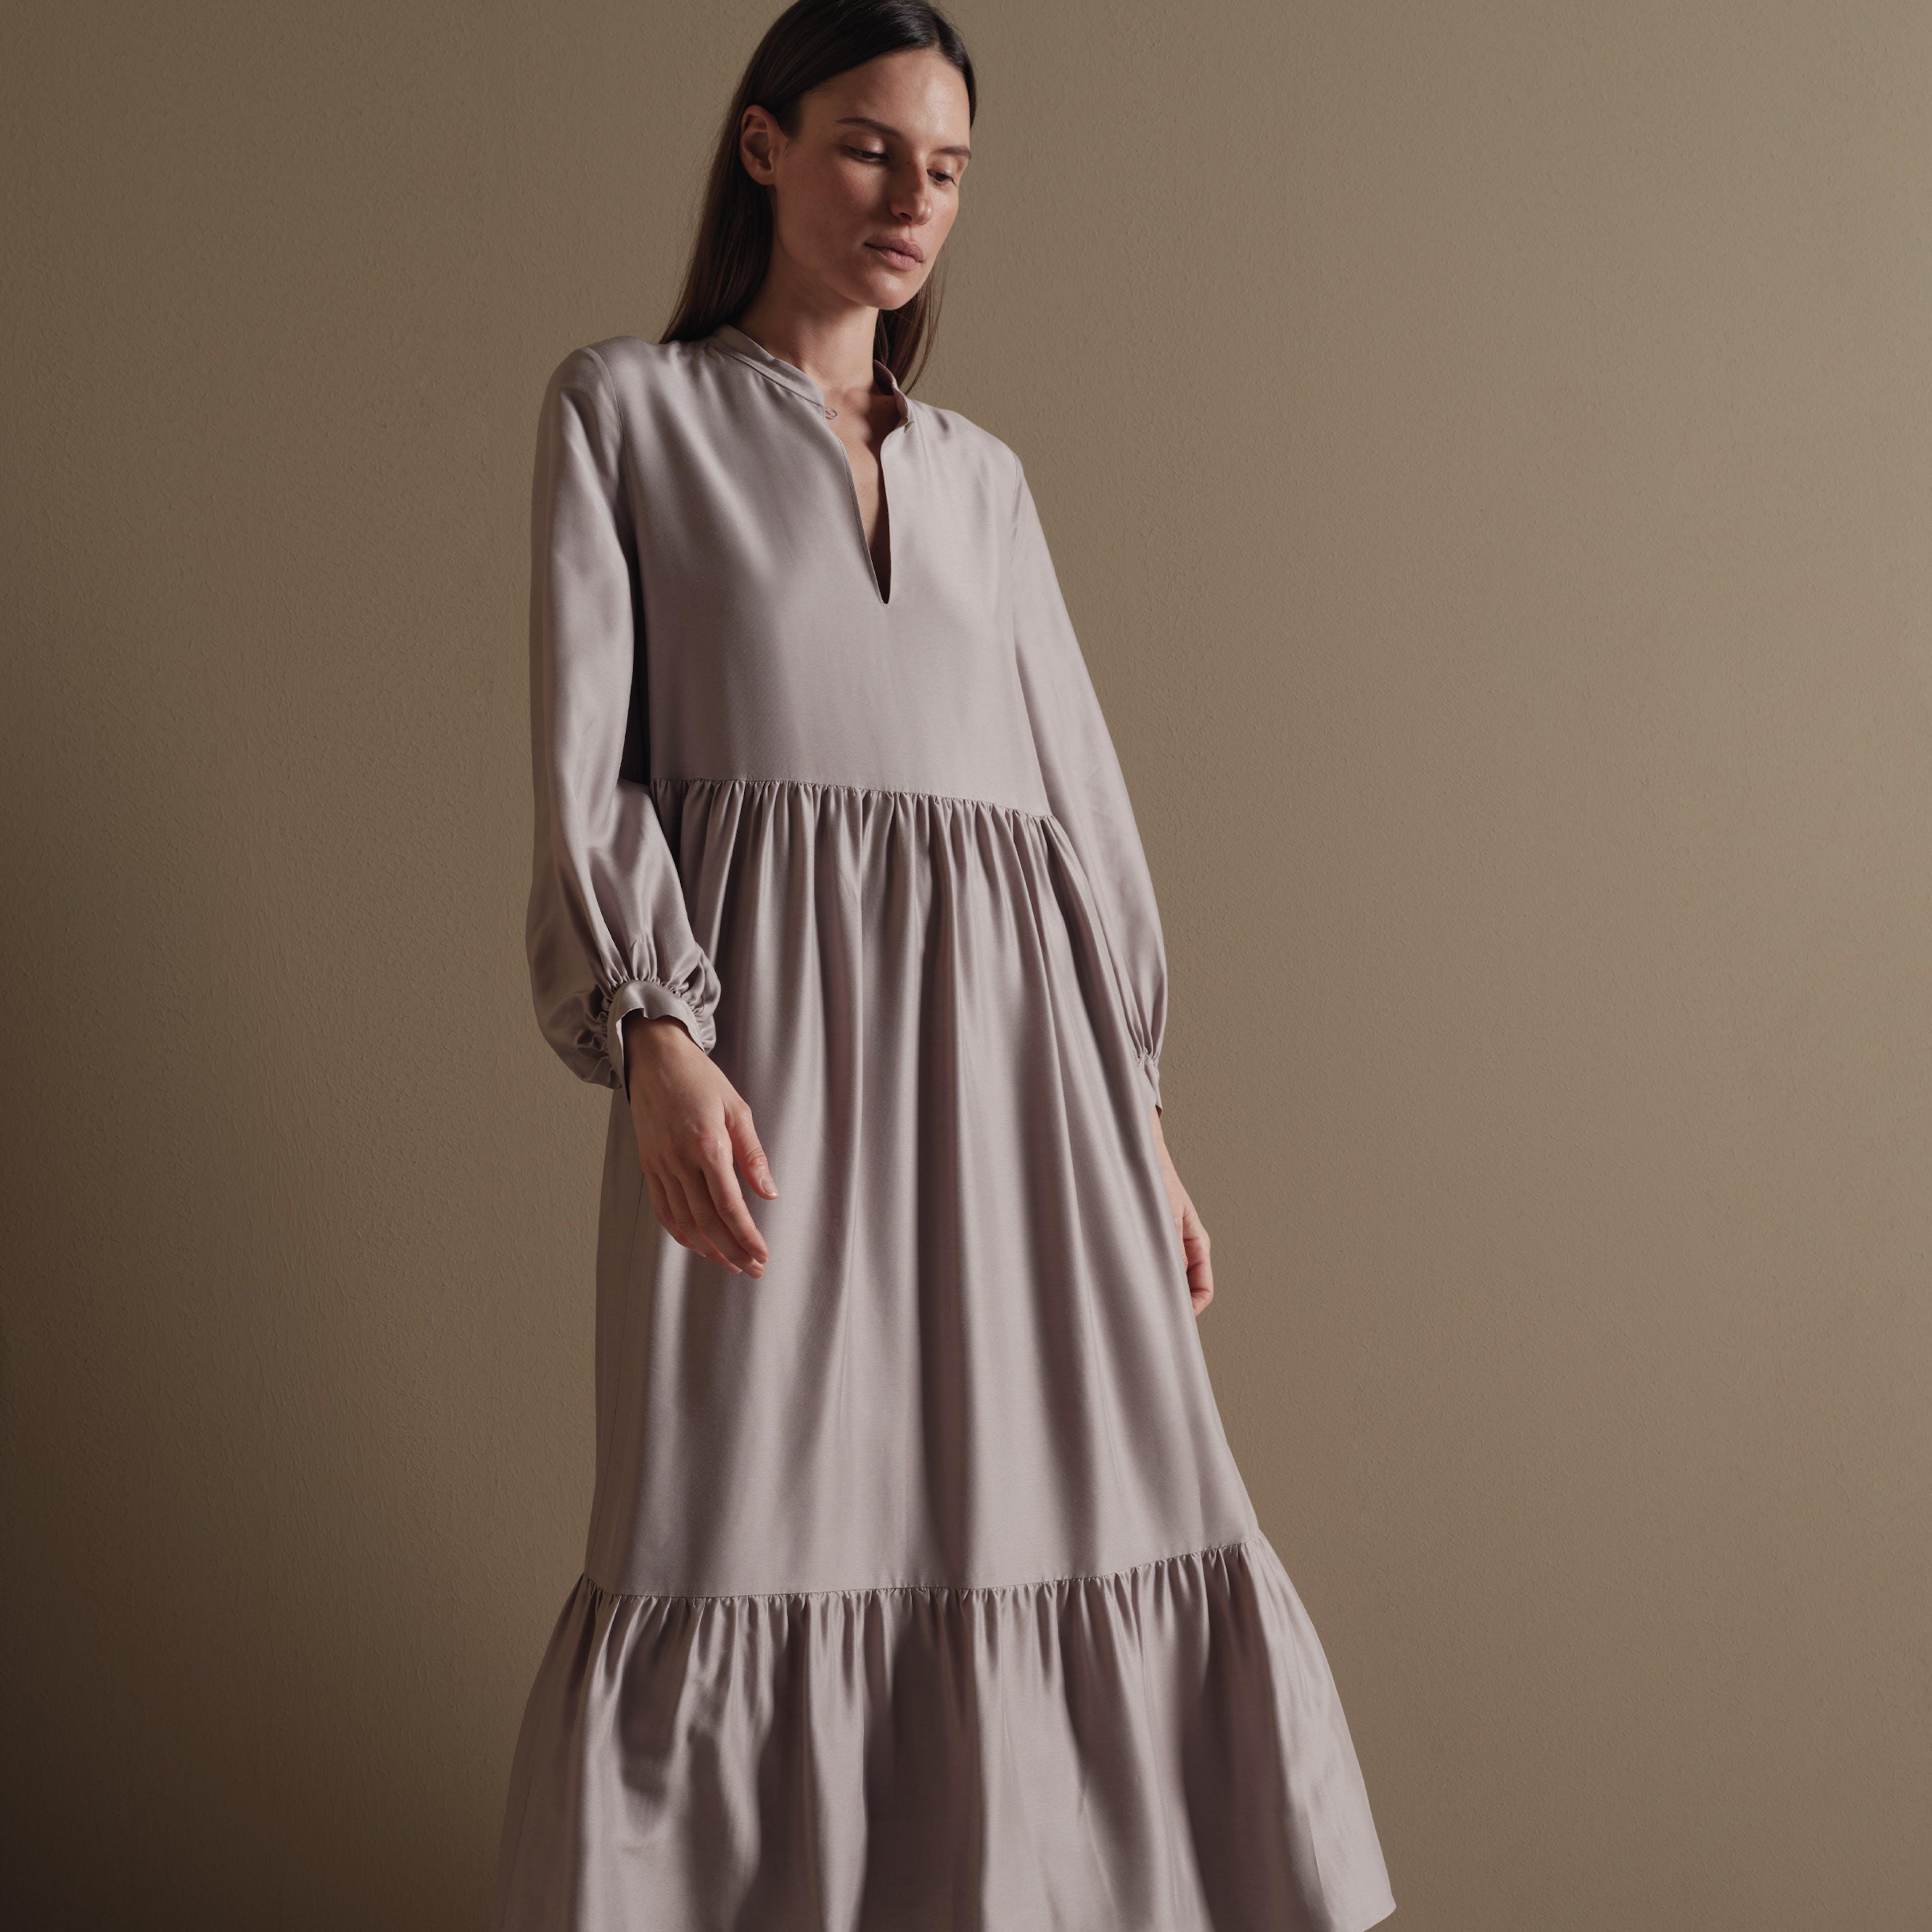 Damen Kleid beige